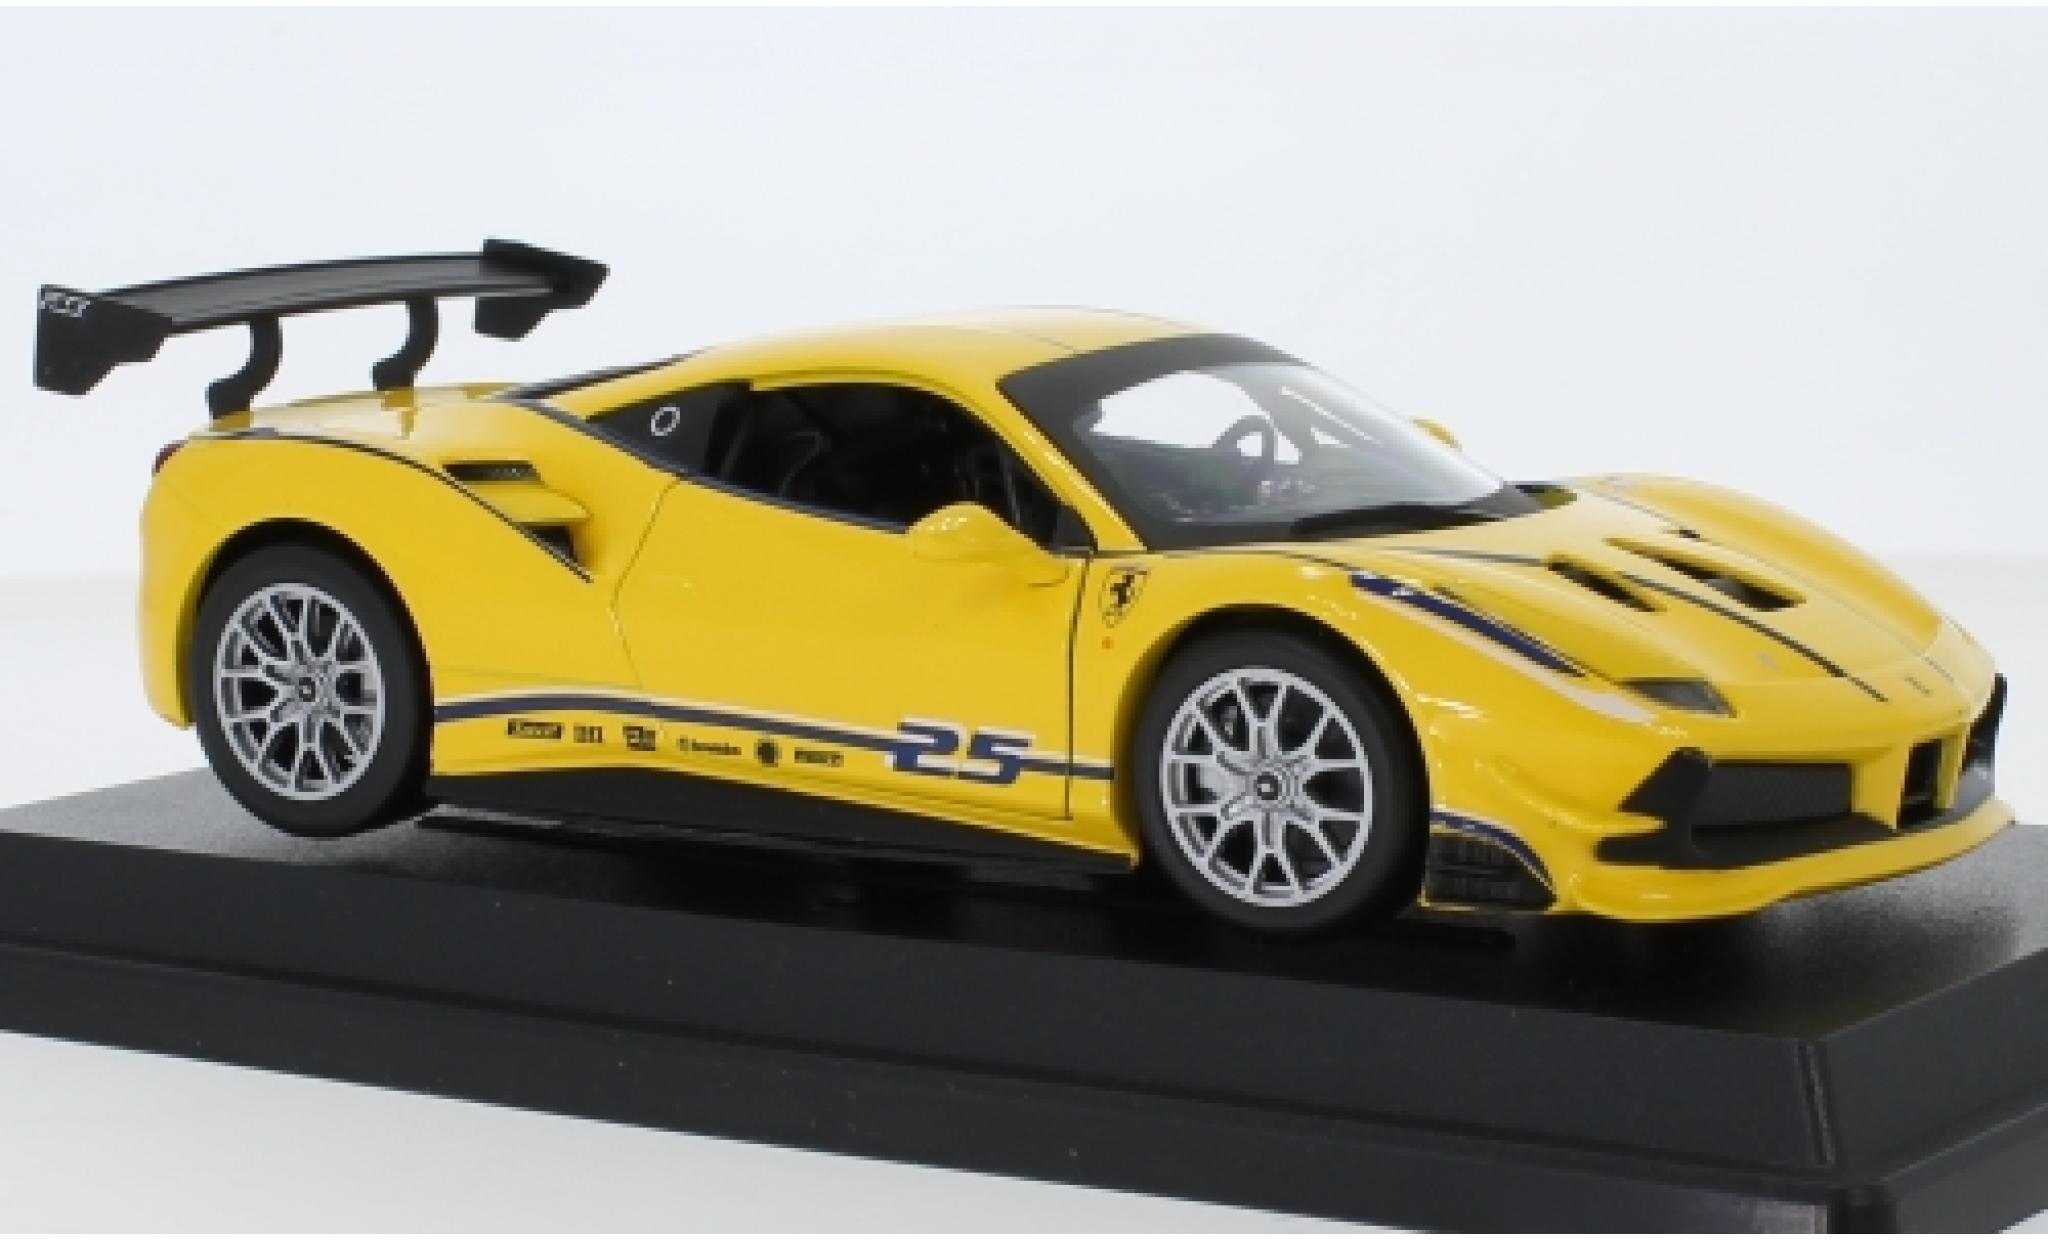 Ferrari 488 1/24 Bburago Challenge jaune No.25